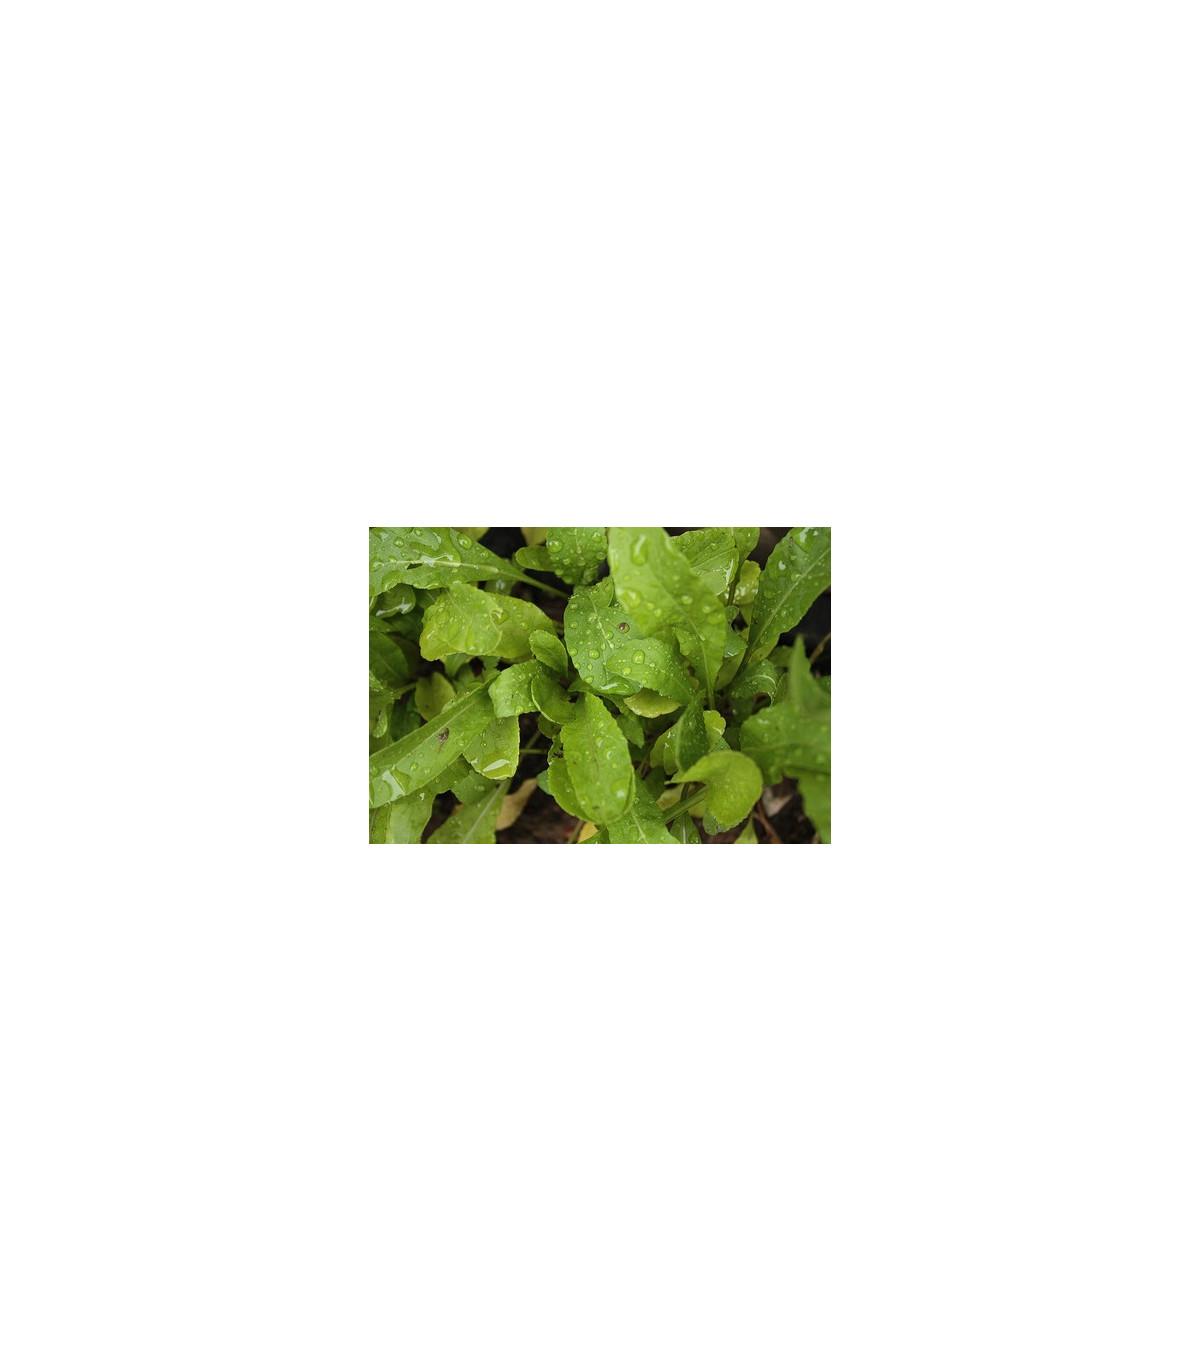 BIO Rukola Roma - semena bio Rukoly - 50 ks